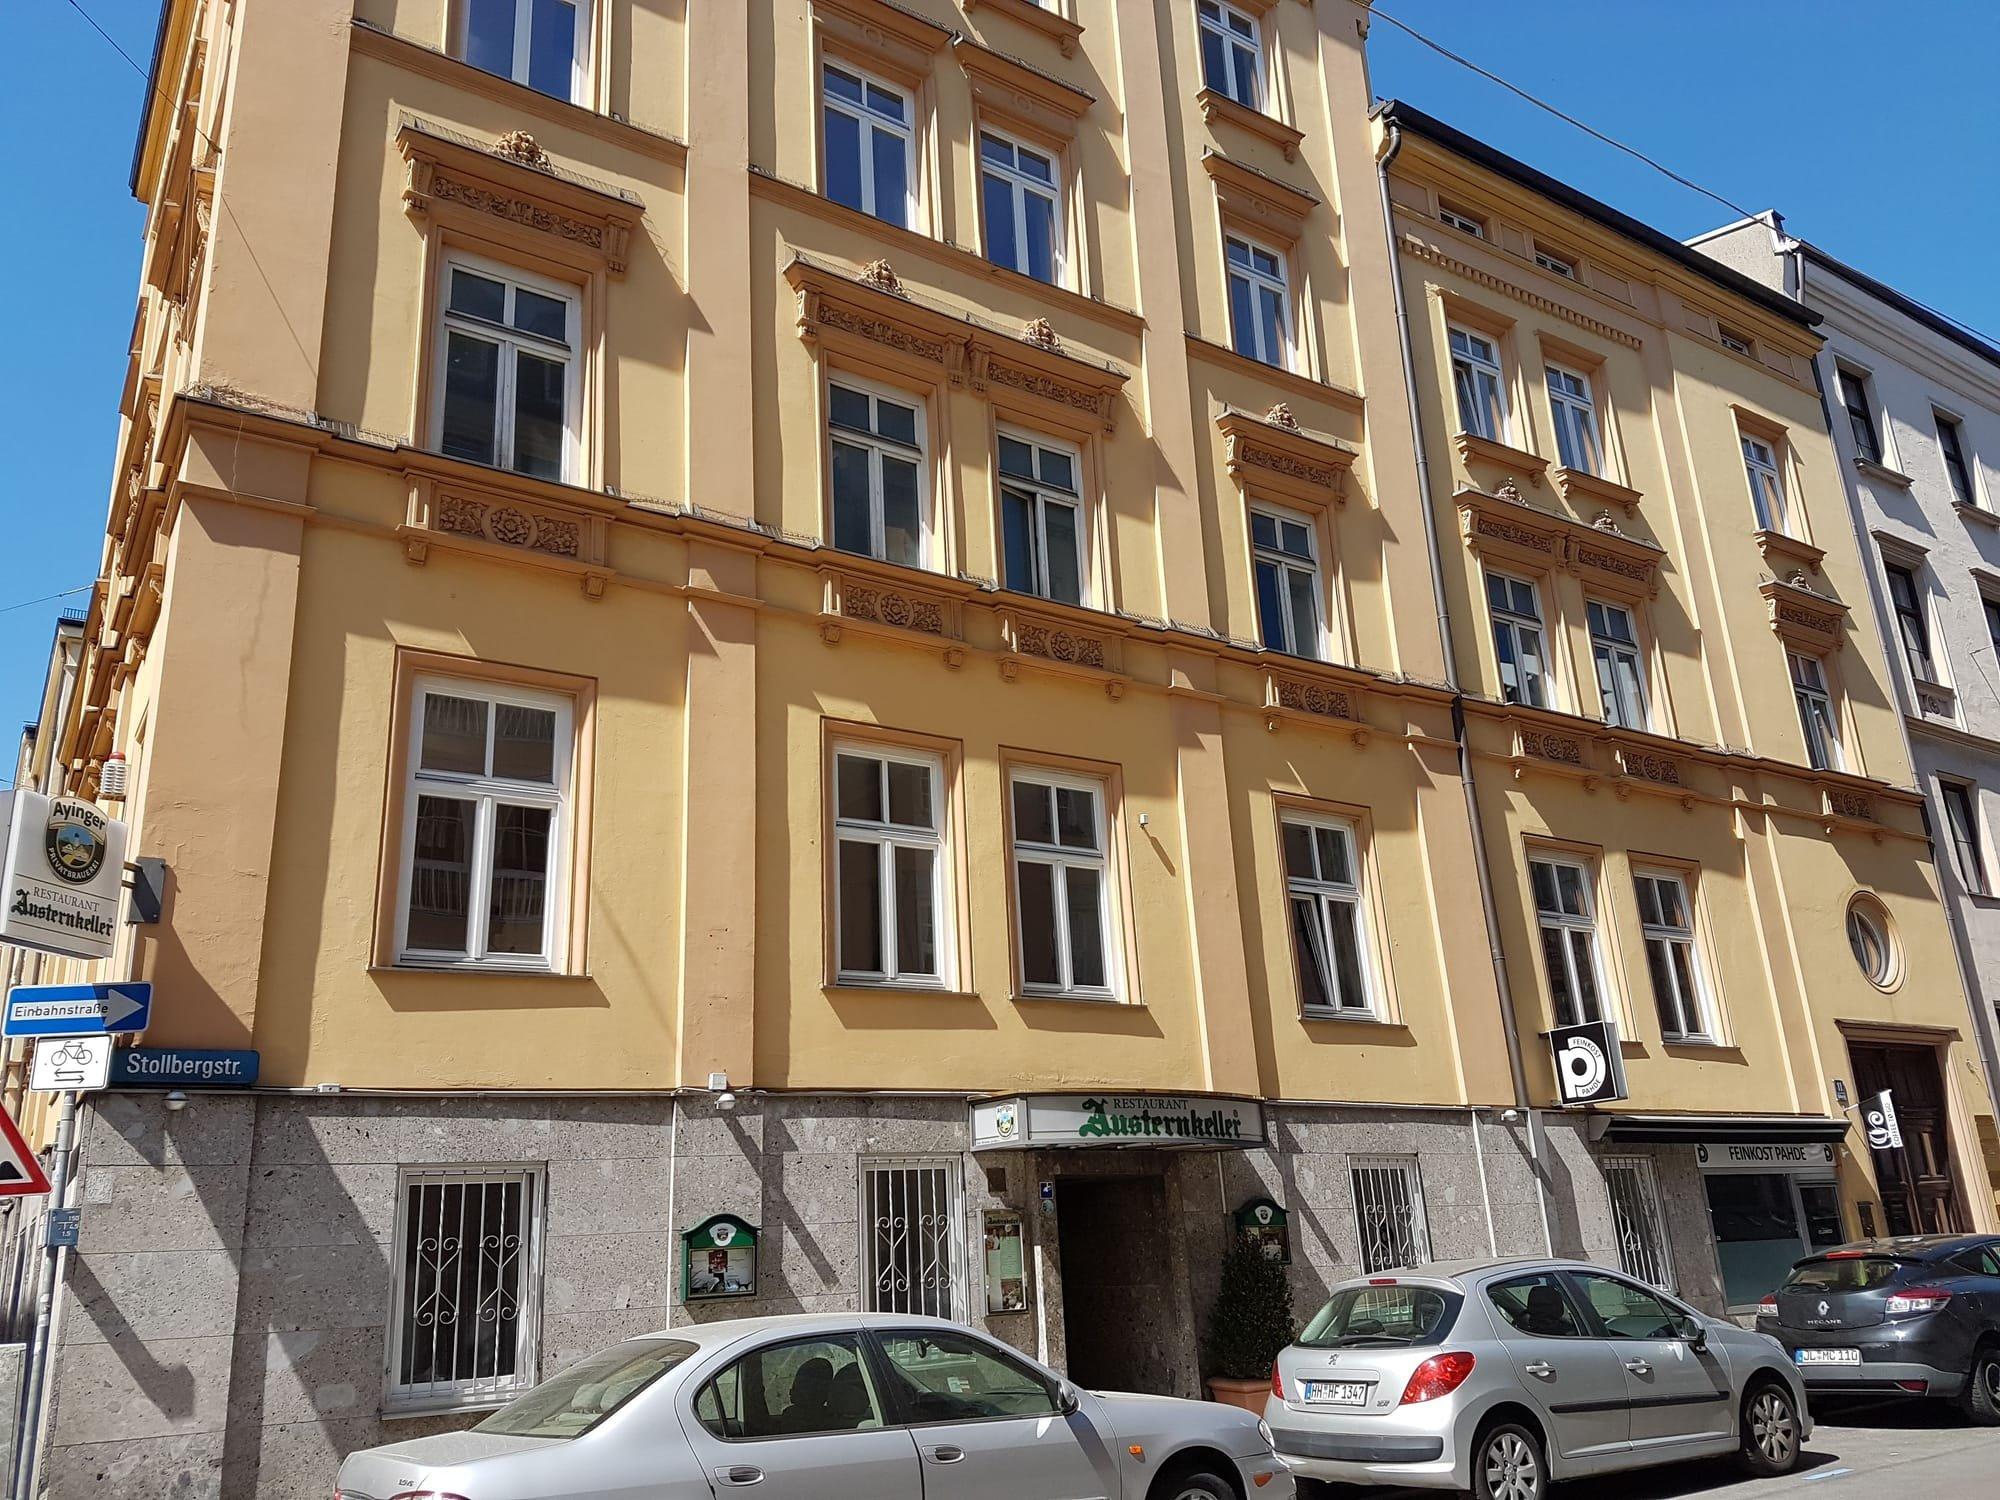 11 Stollbergstraße